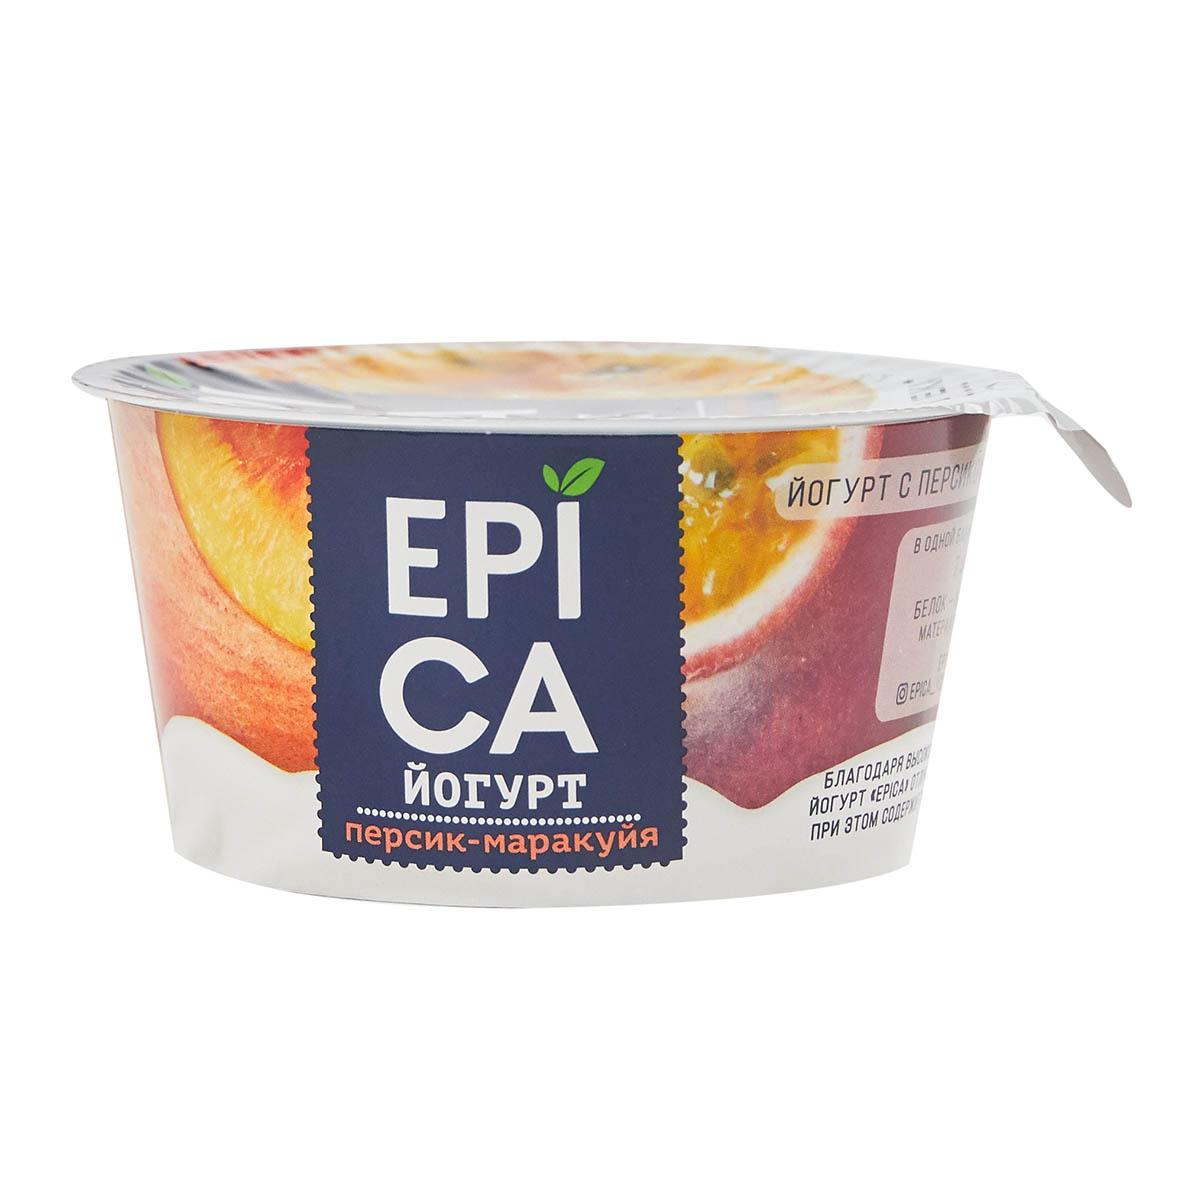 Epica 4,8% персик-маракуйя